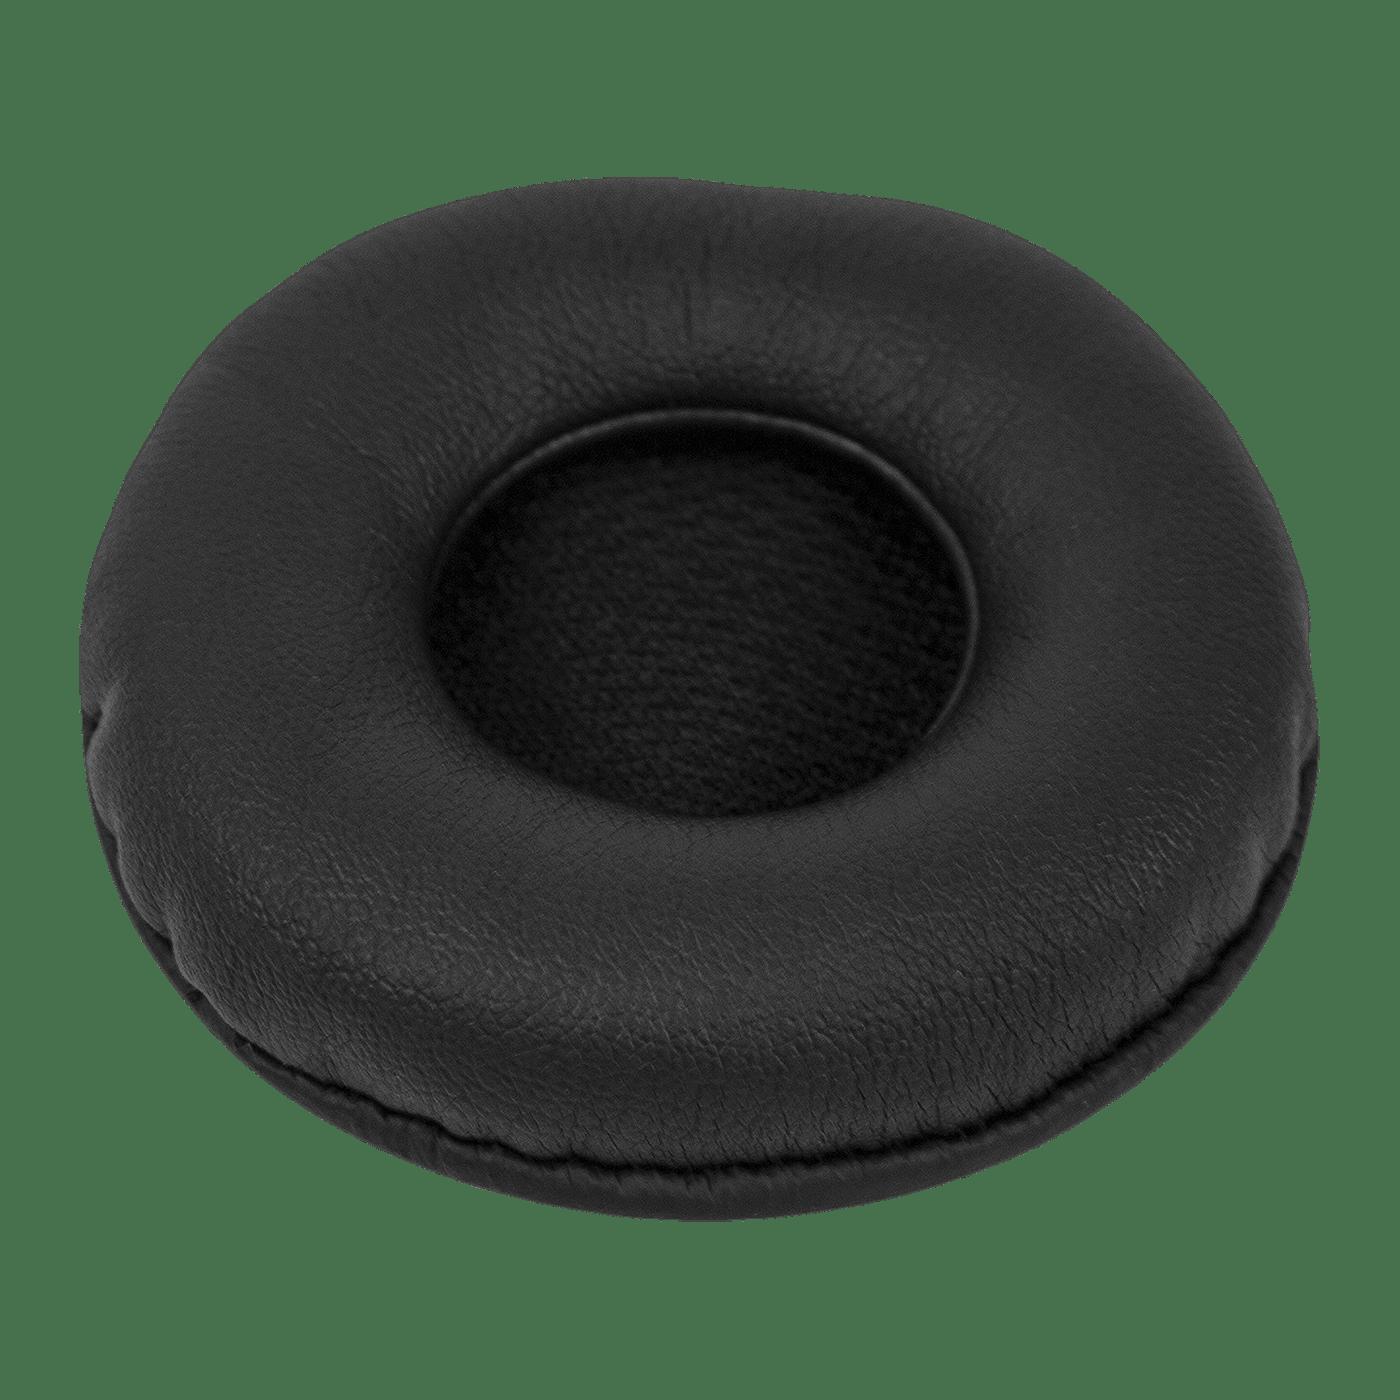 Jabra UC Voice 550 Leather Ear Cushions